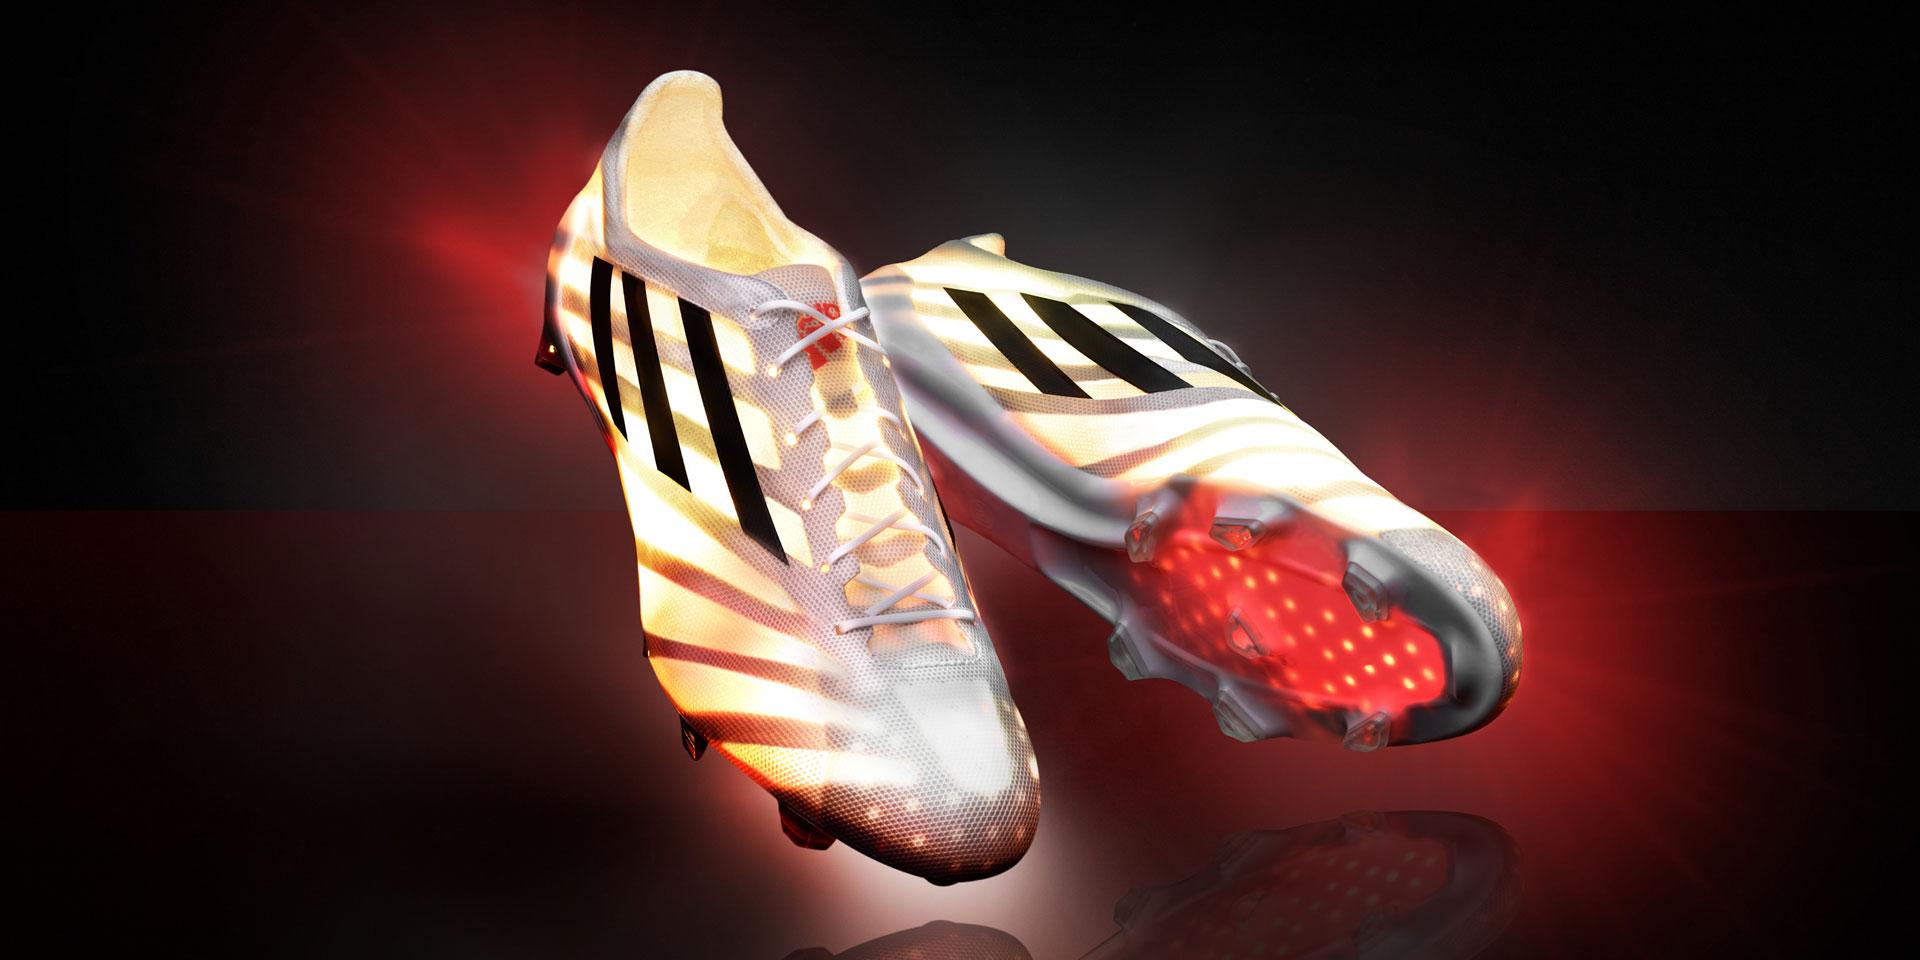 Adidas adizero 99g - F50 adizero mit 99Gramm